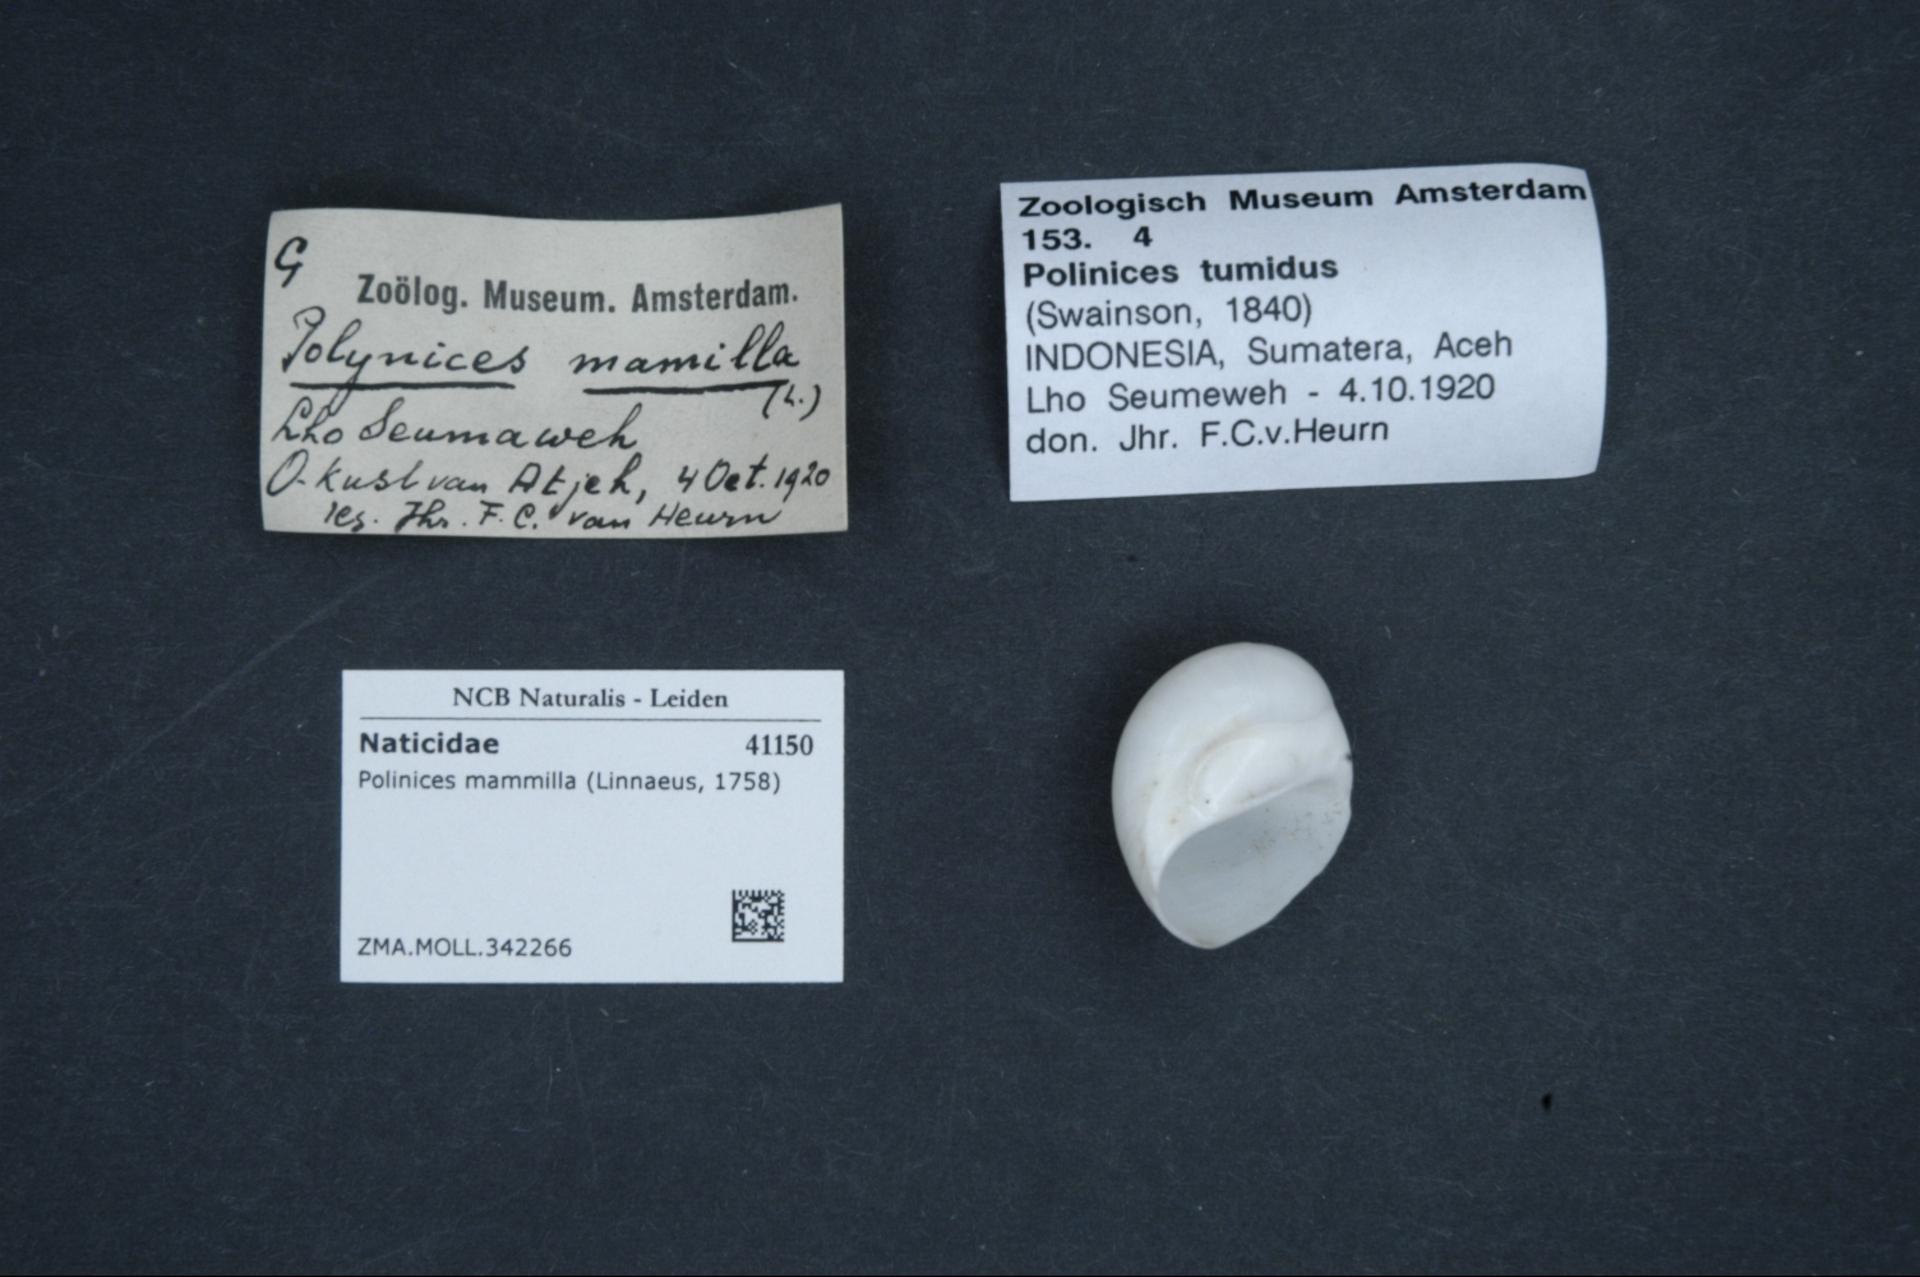 ZMA.MOLL.342266 | Polinices mammilla (Linnaeus, 1758)